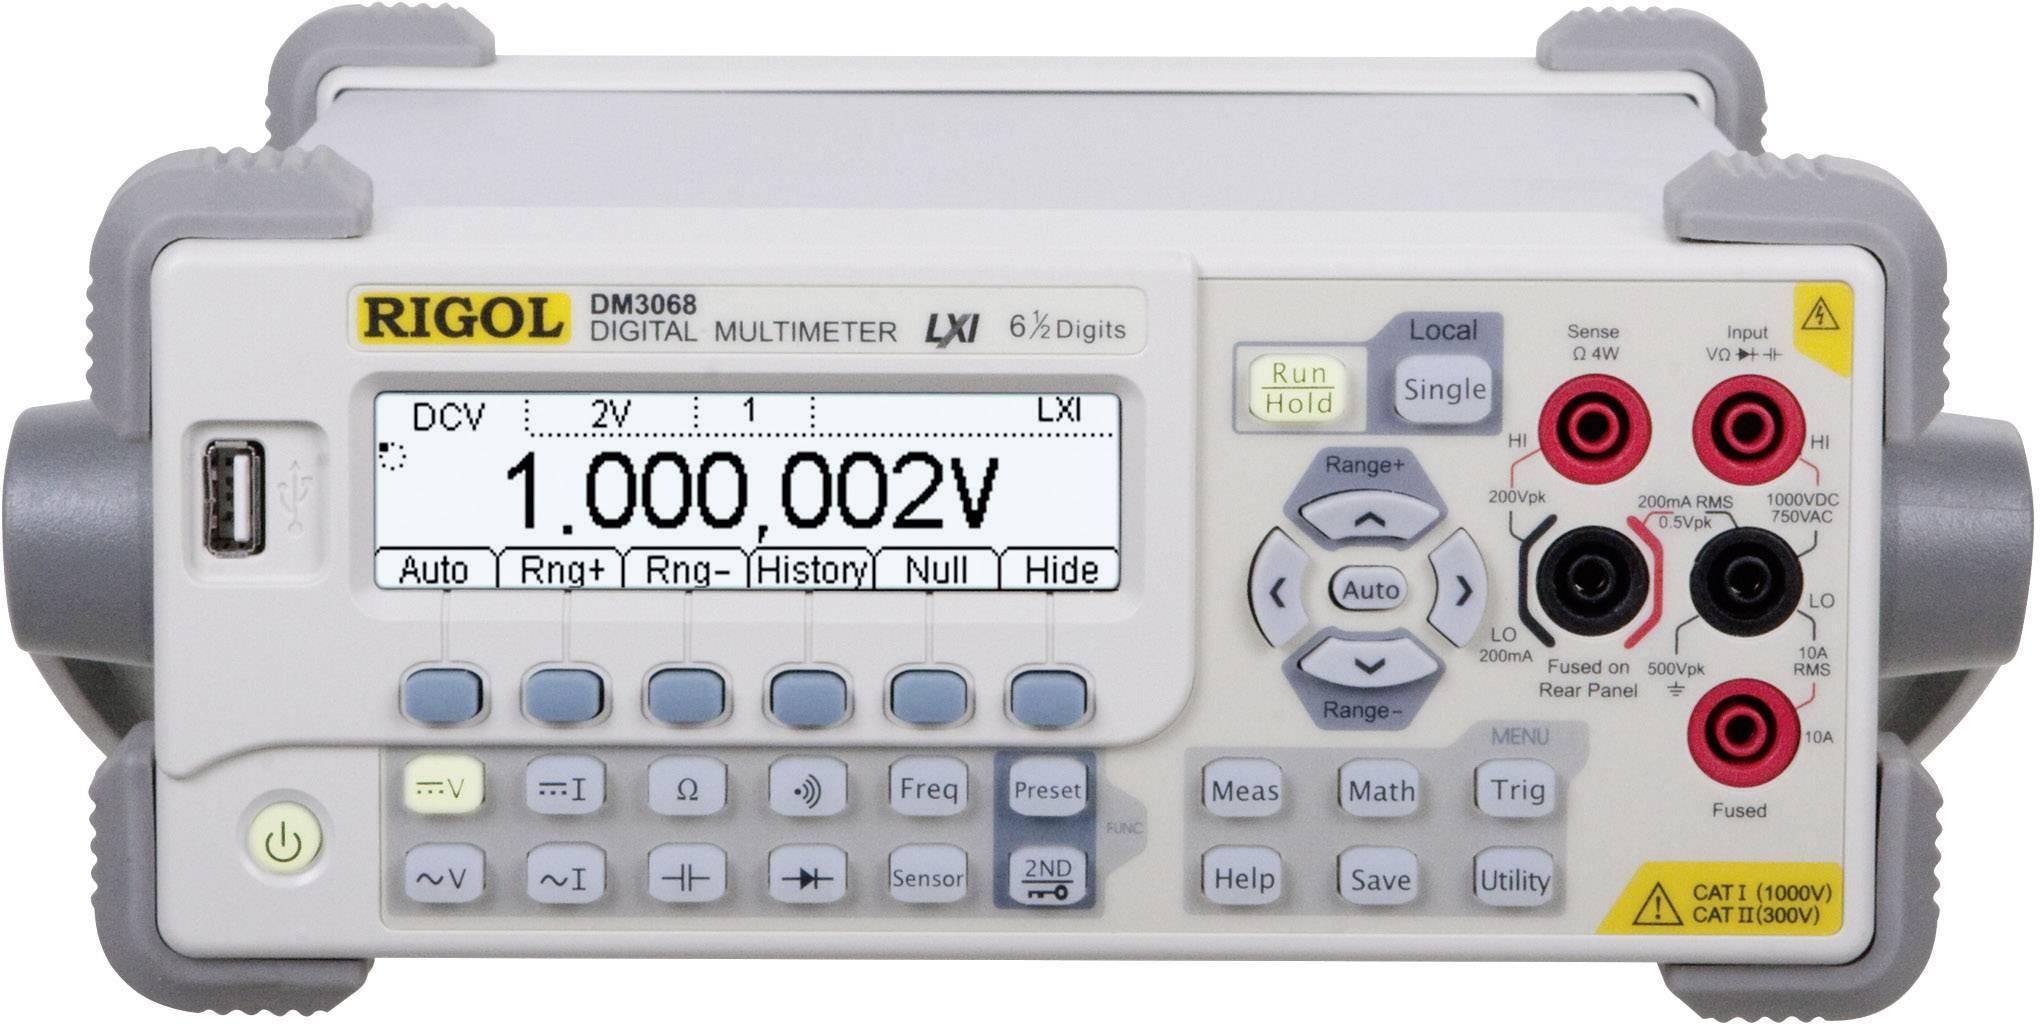 Digitálne/y stolný mutlimeter Rigol DM3068